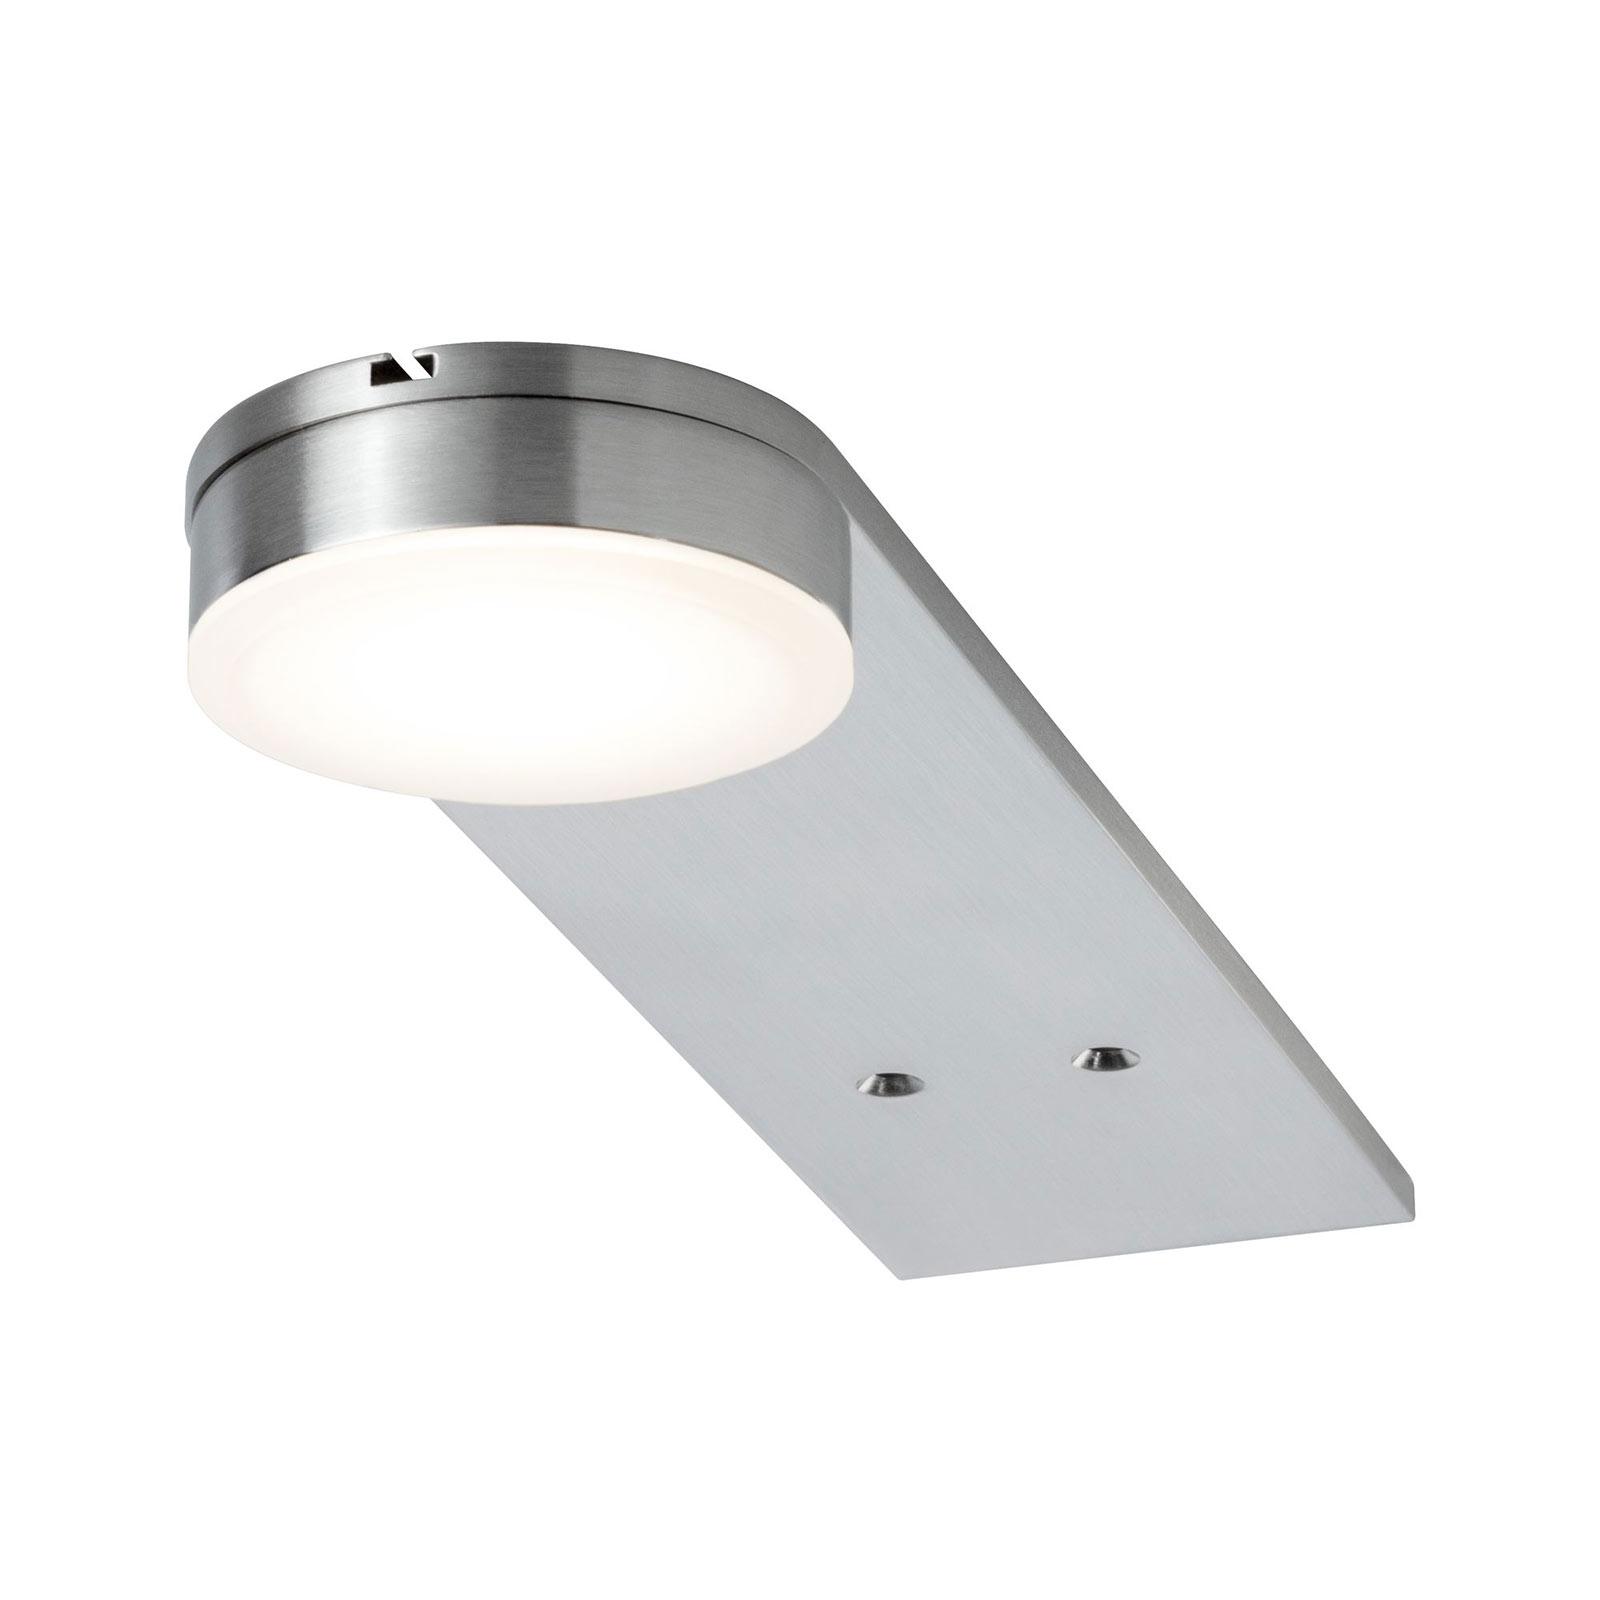 Paulmann Setup LED-møbellampe, 3 stk., rund